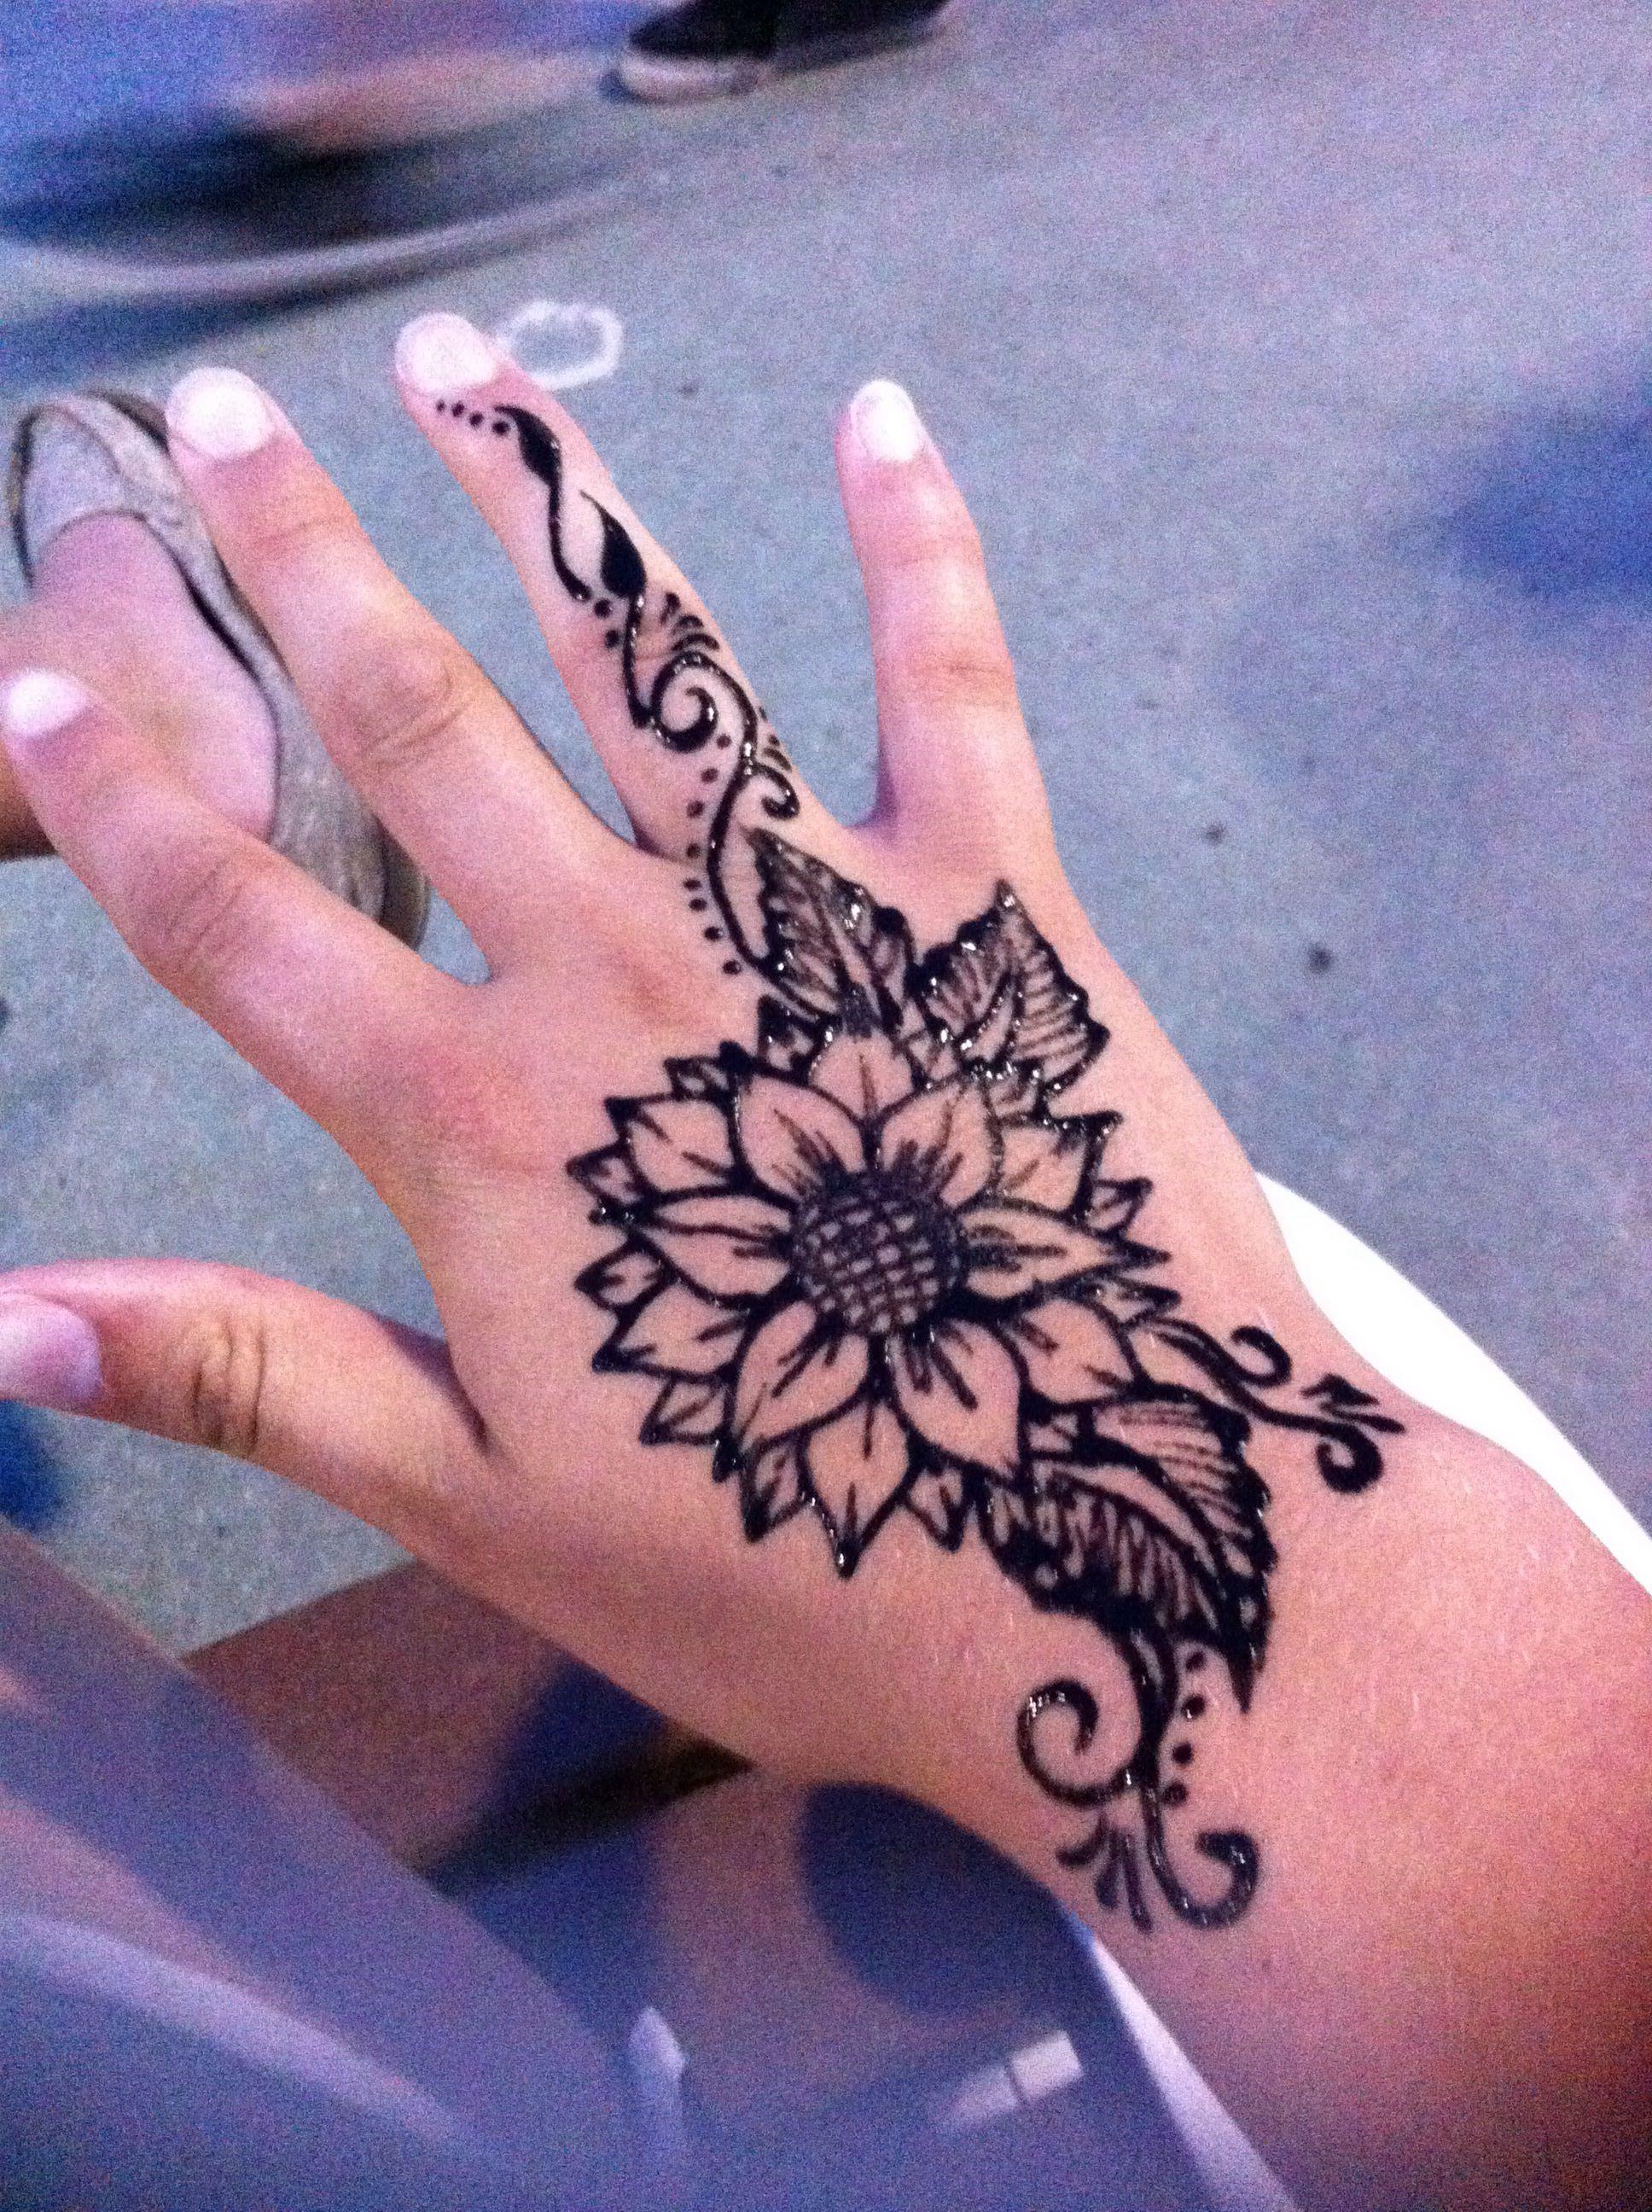 Sunflower henna tattoo Henna tattoo designs, Henna